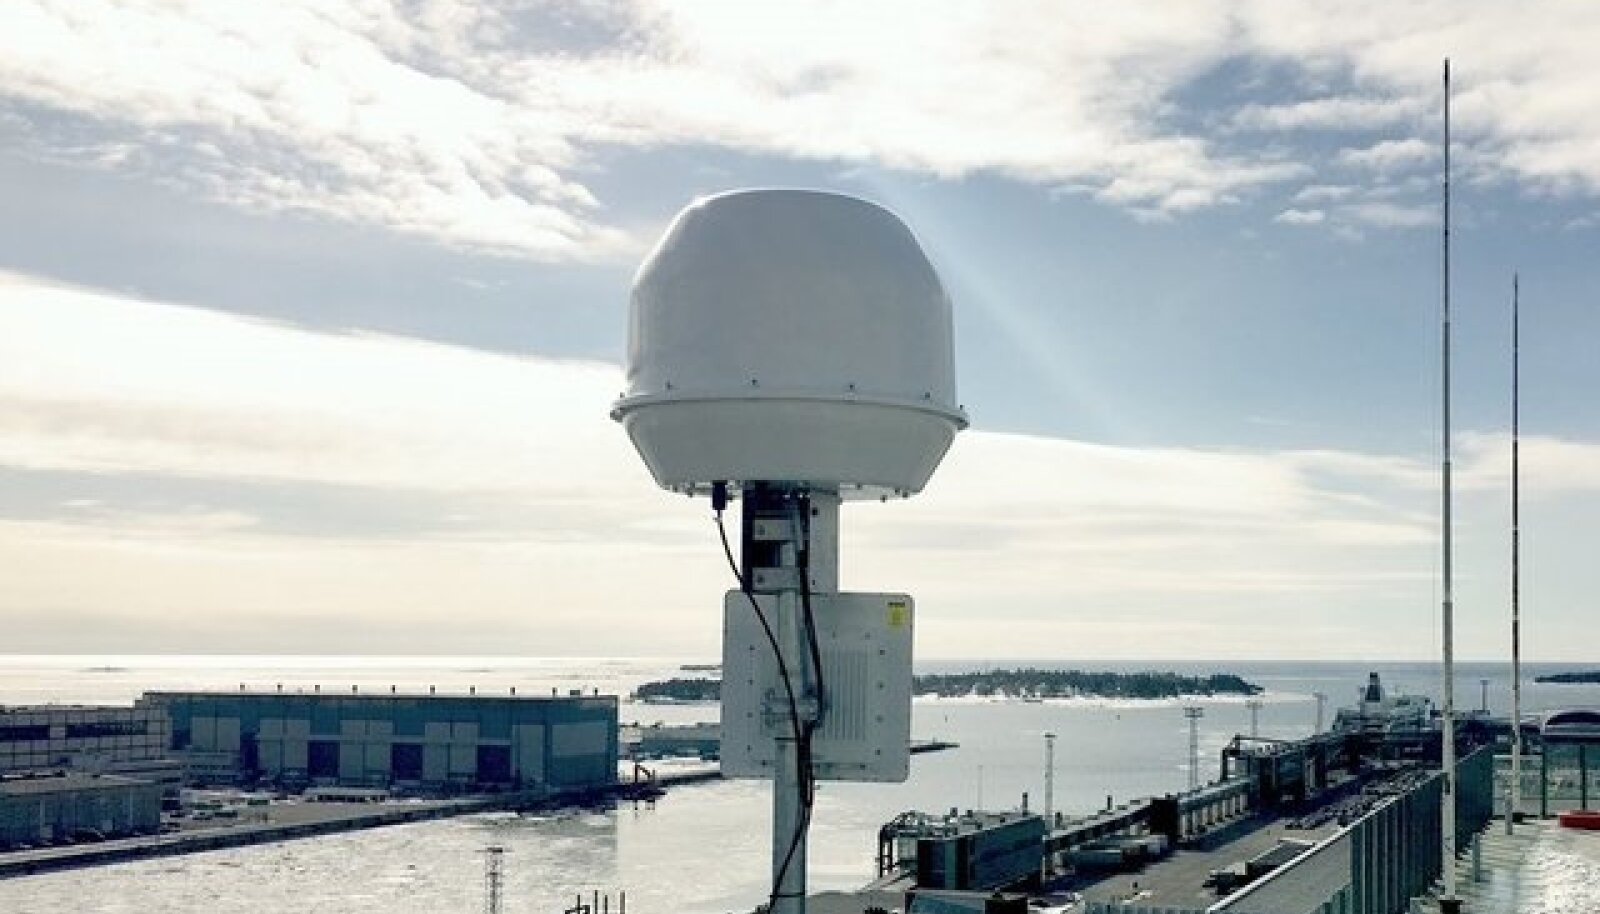 Megastari pardal kasutatav antenn